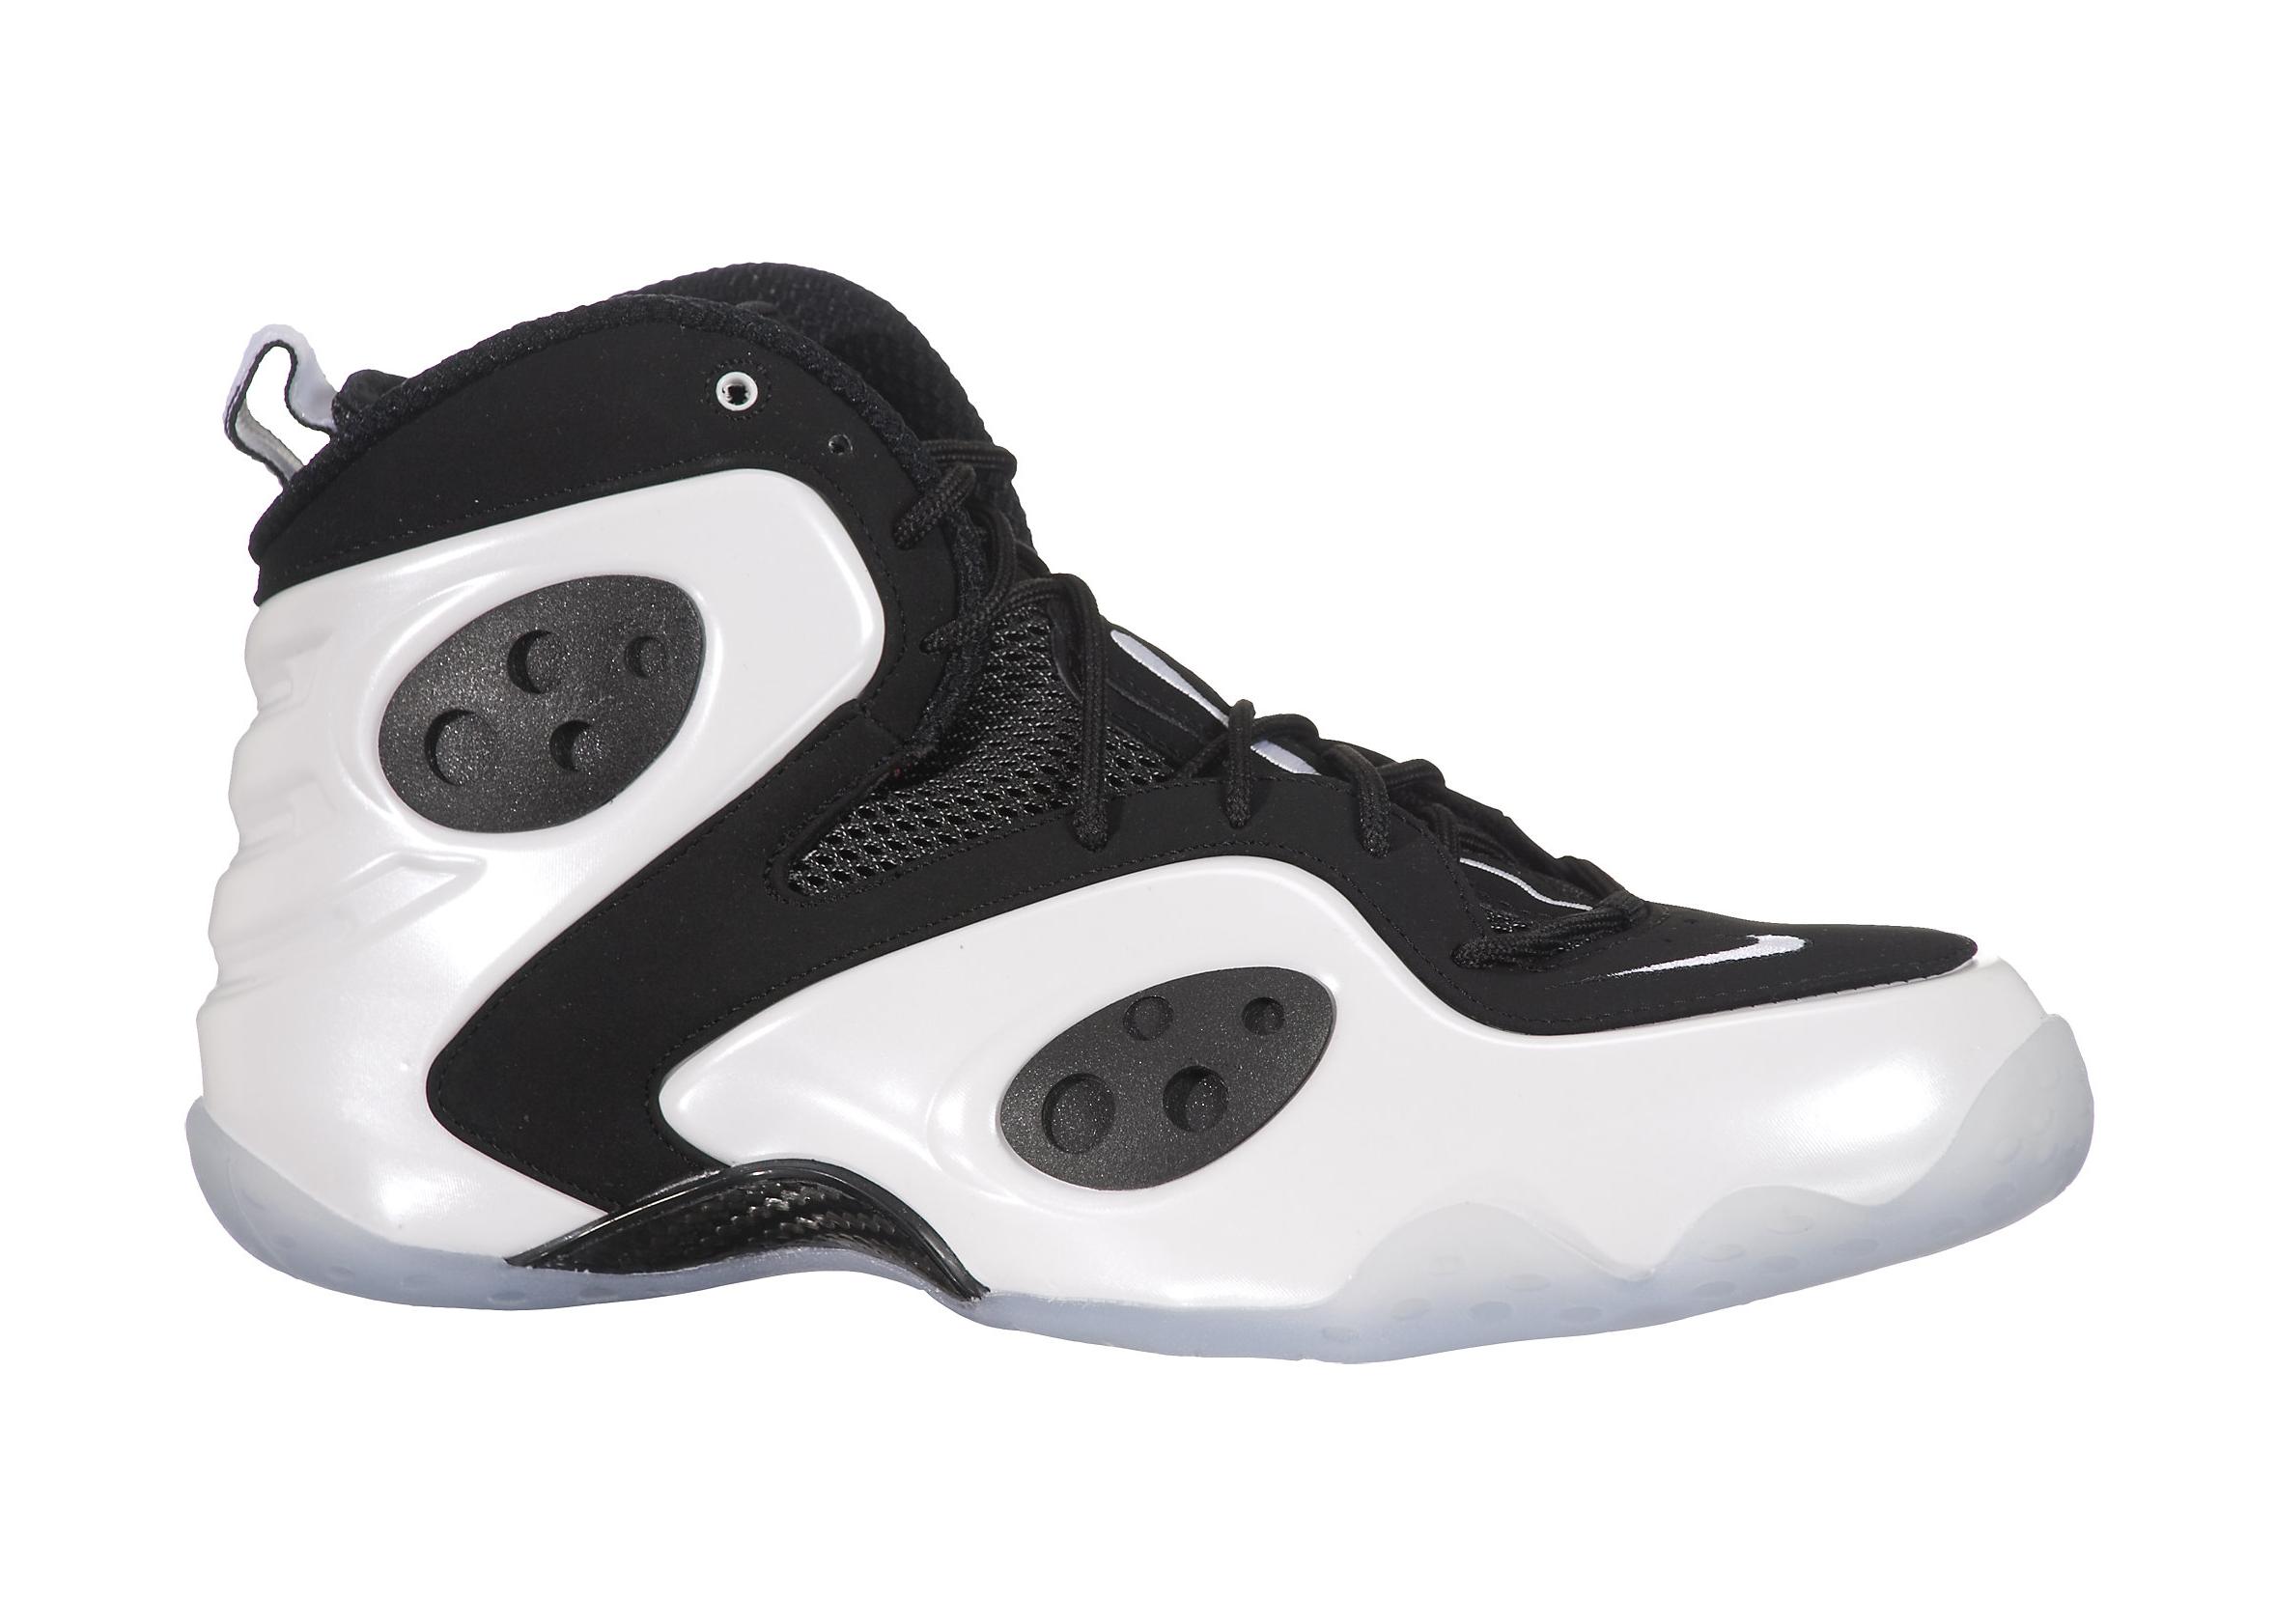 Nike Zoom Rookie White Black - 472688-100